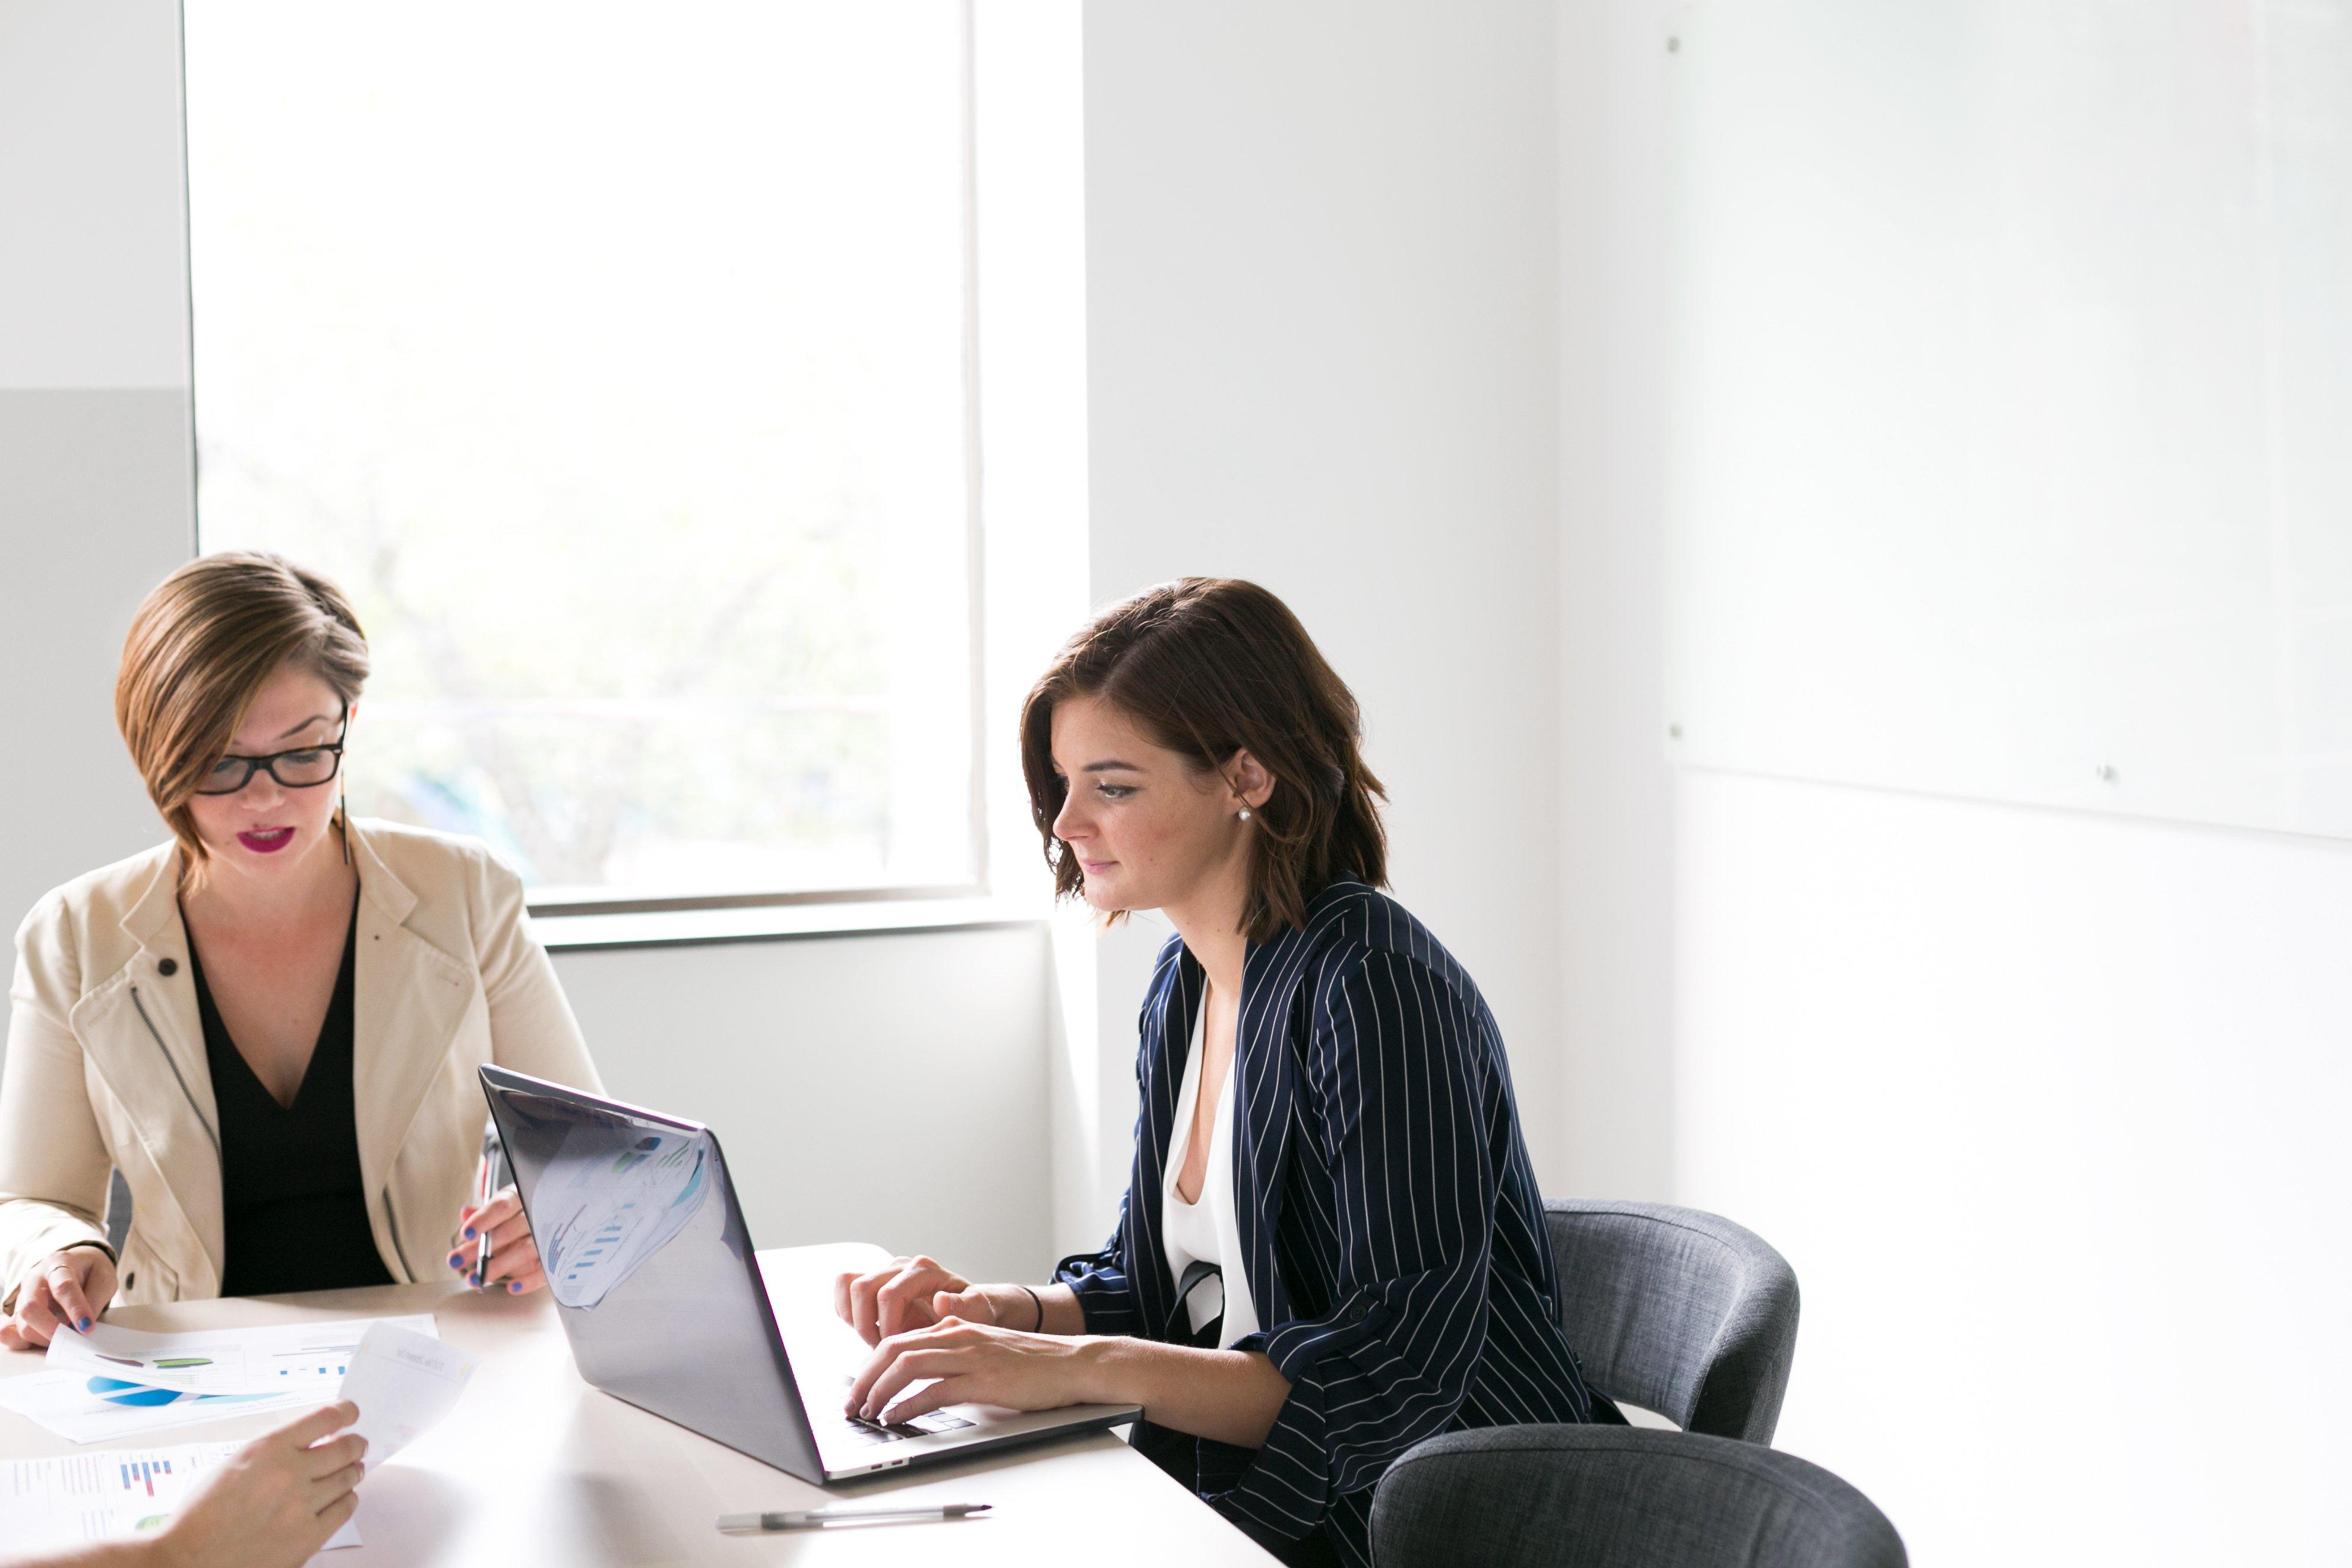 women-in-business-meeting_4460x4460.jpg